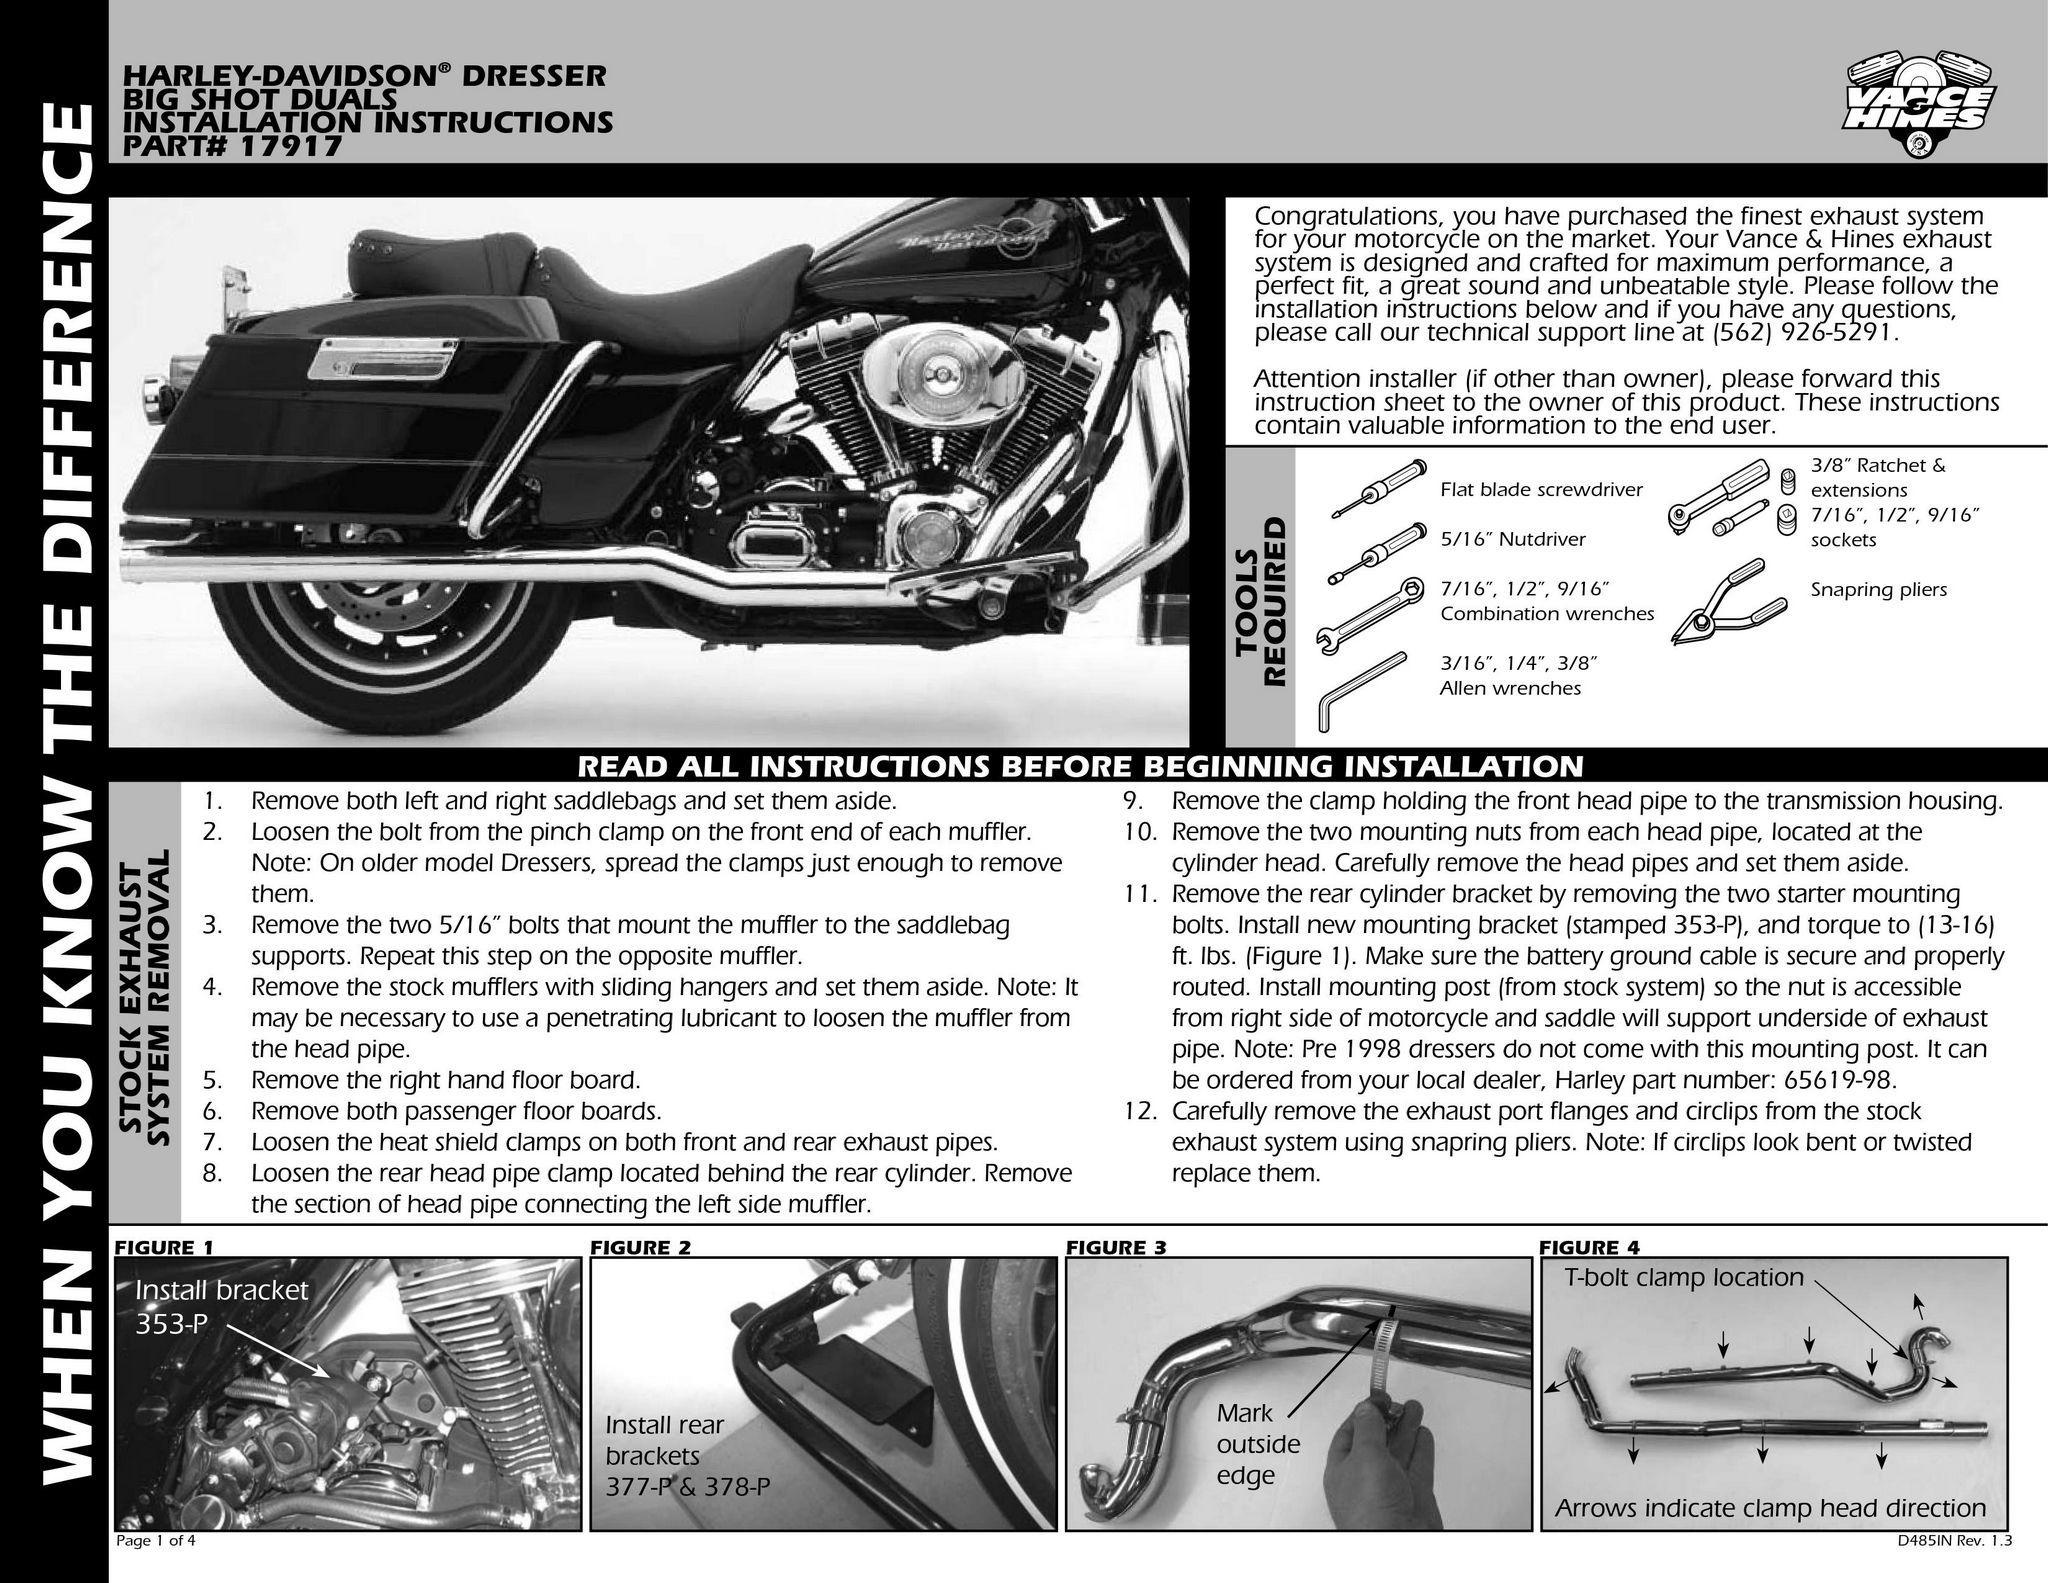 【VANCE&HINES】BIG SHOT DUALS 全段排氣管 - 「Webike-摩托百貨」